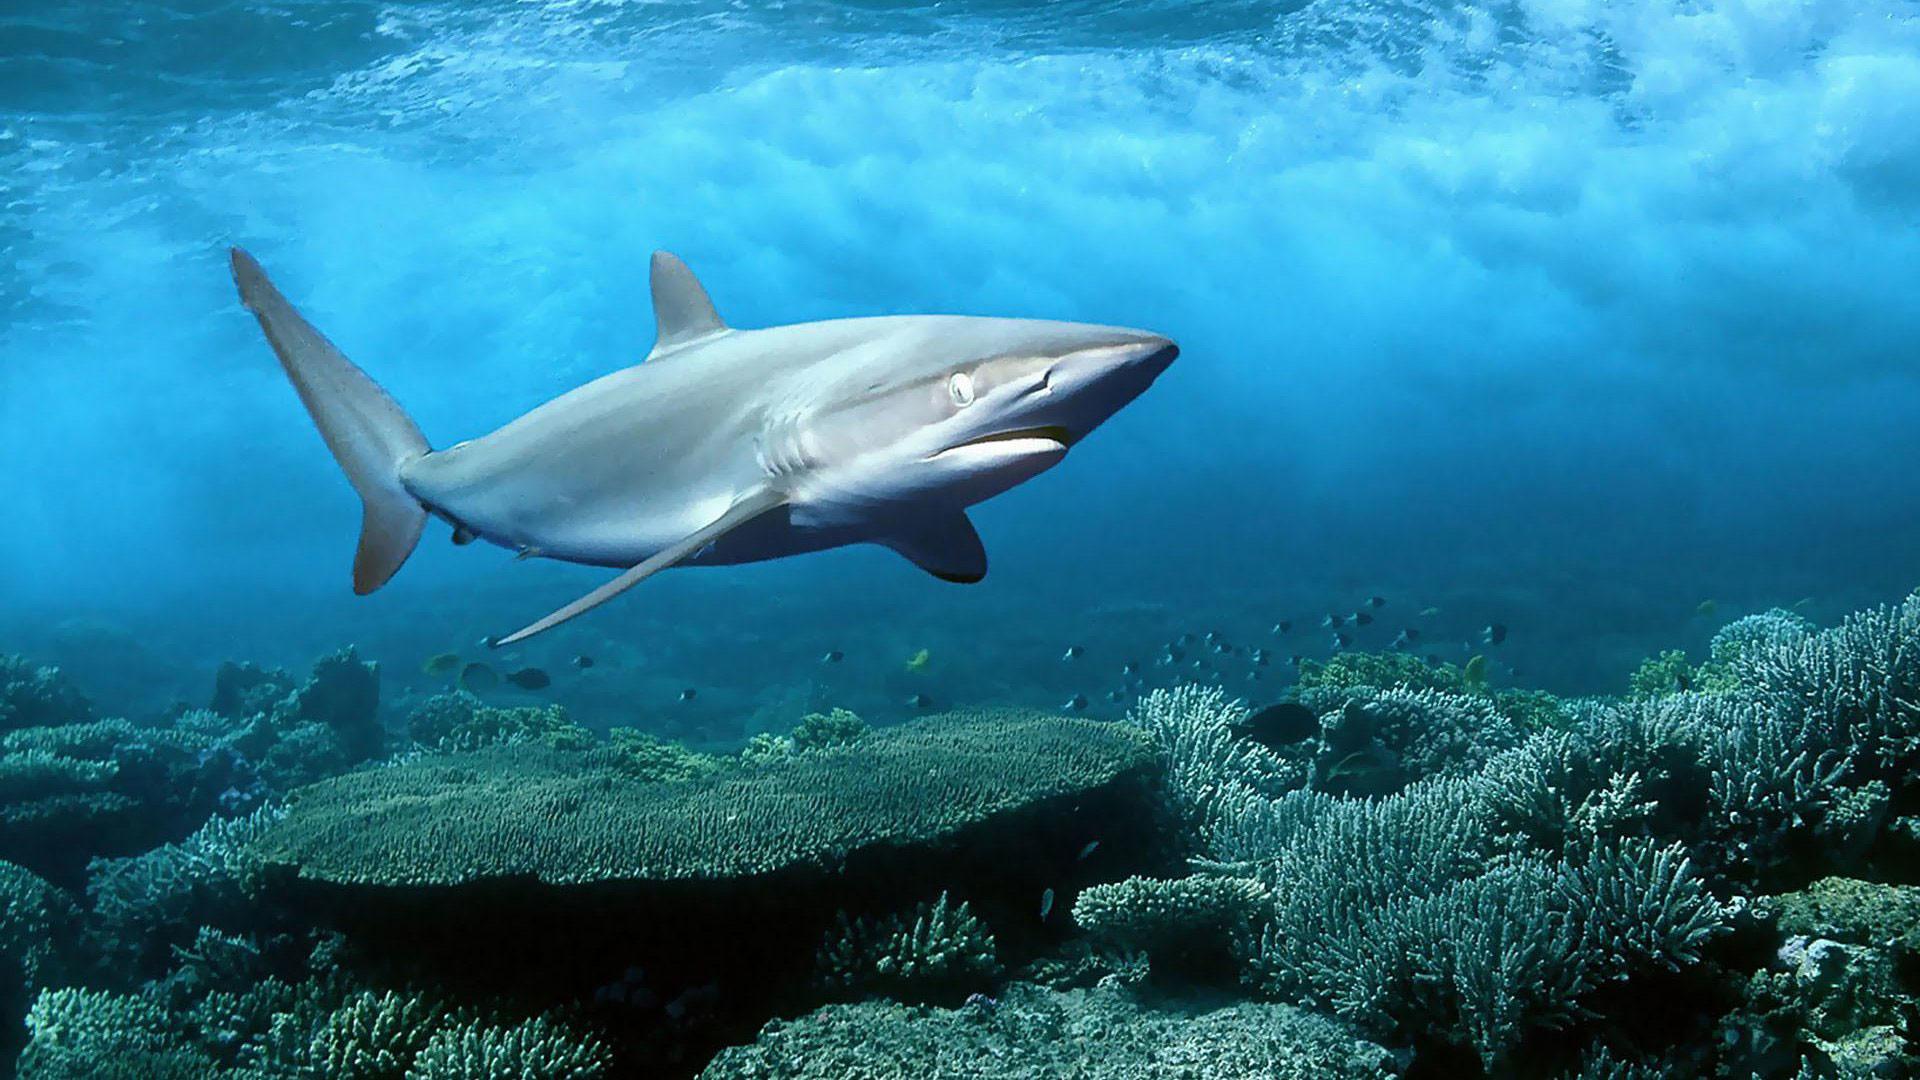 hd pics photos fish shark desktop background wallpaper